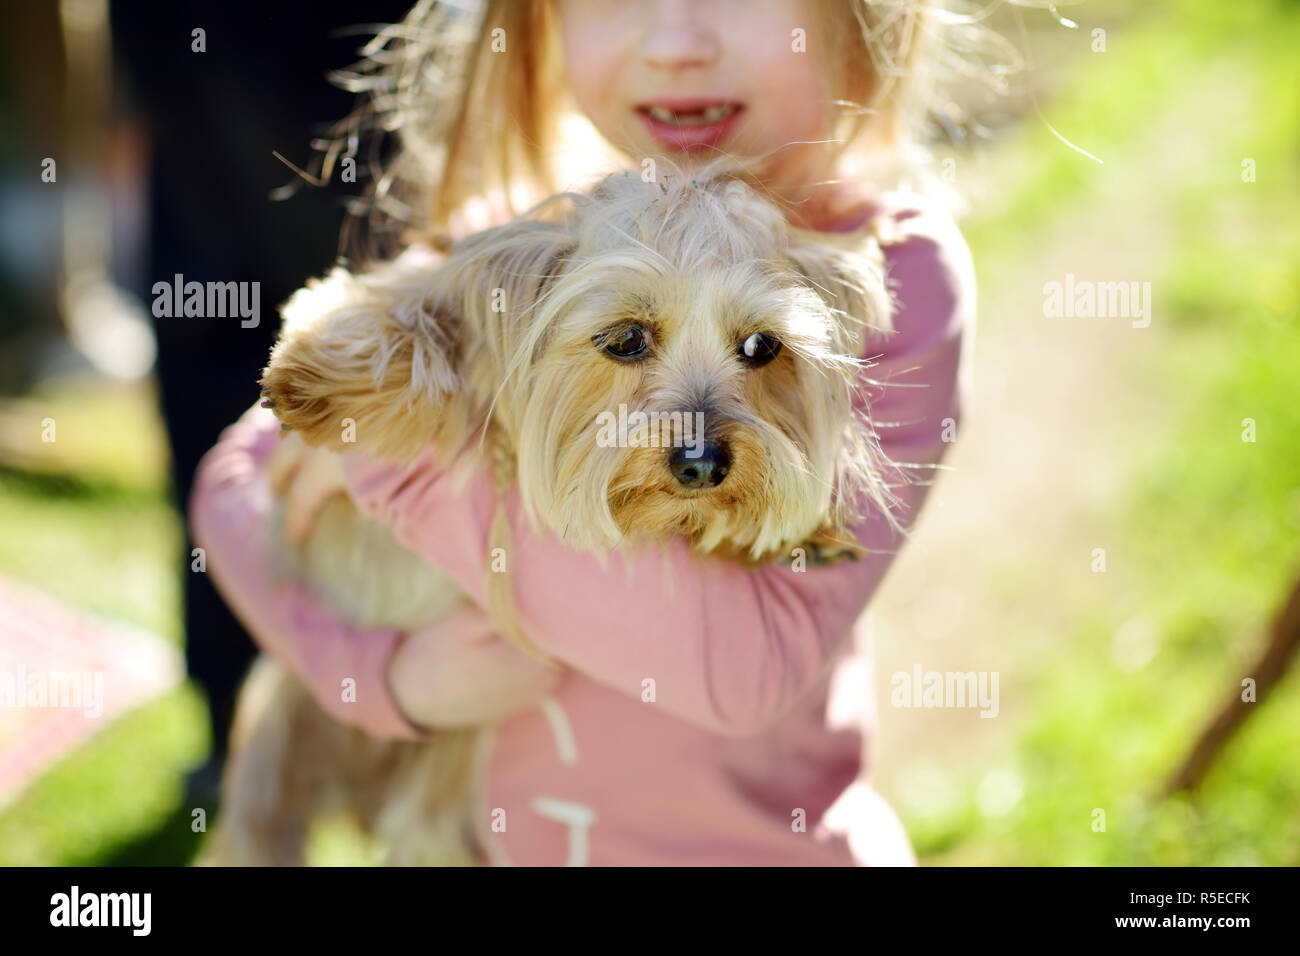 Cute Little Girl Holding Her Funny Yorkshire Terrier Dog Kids